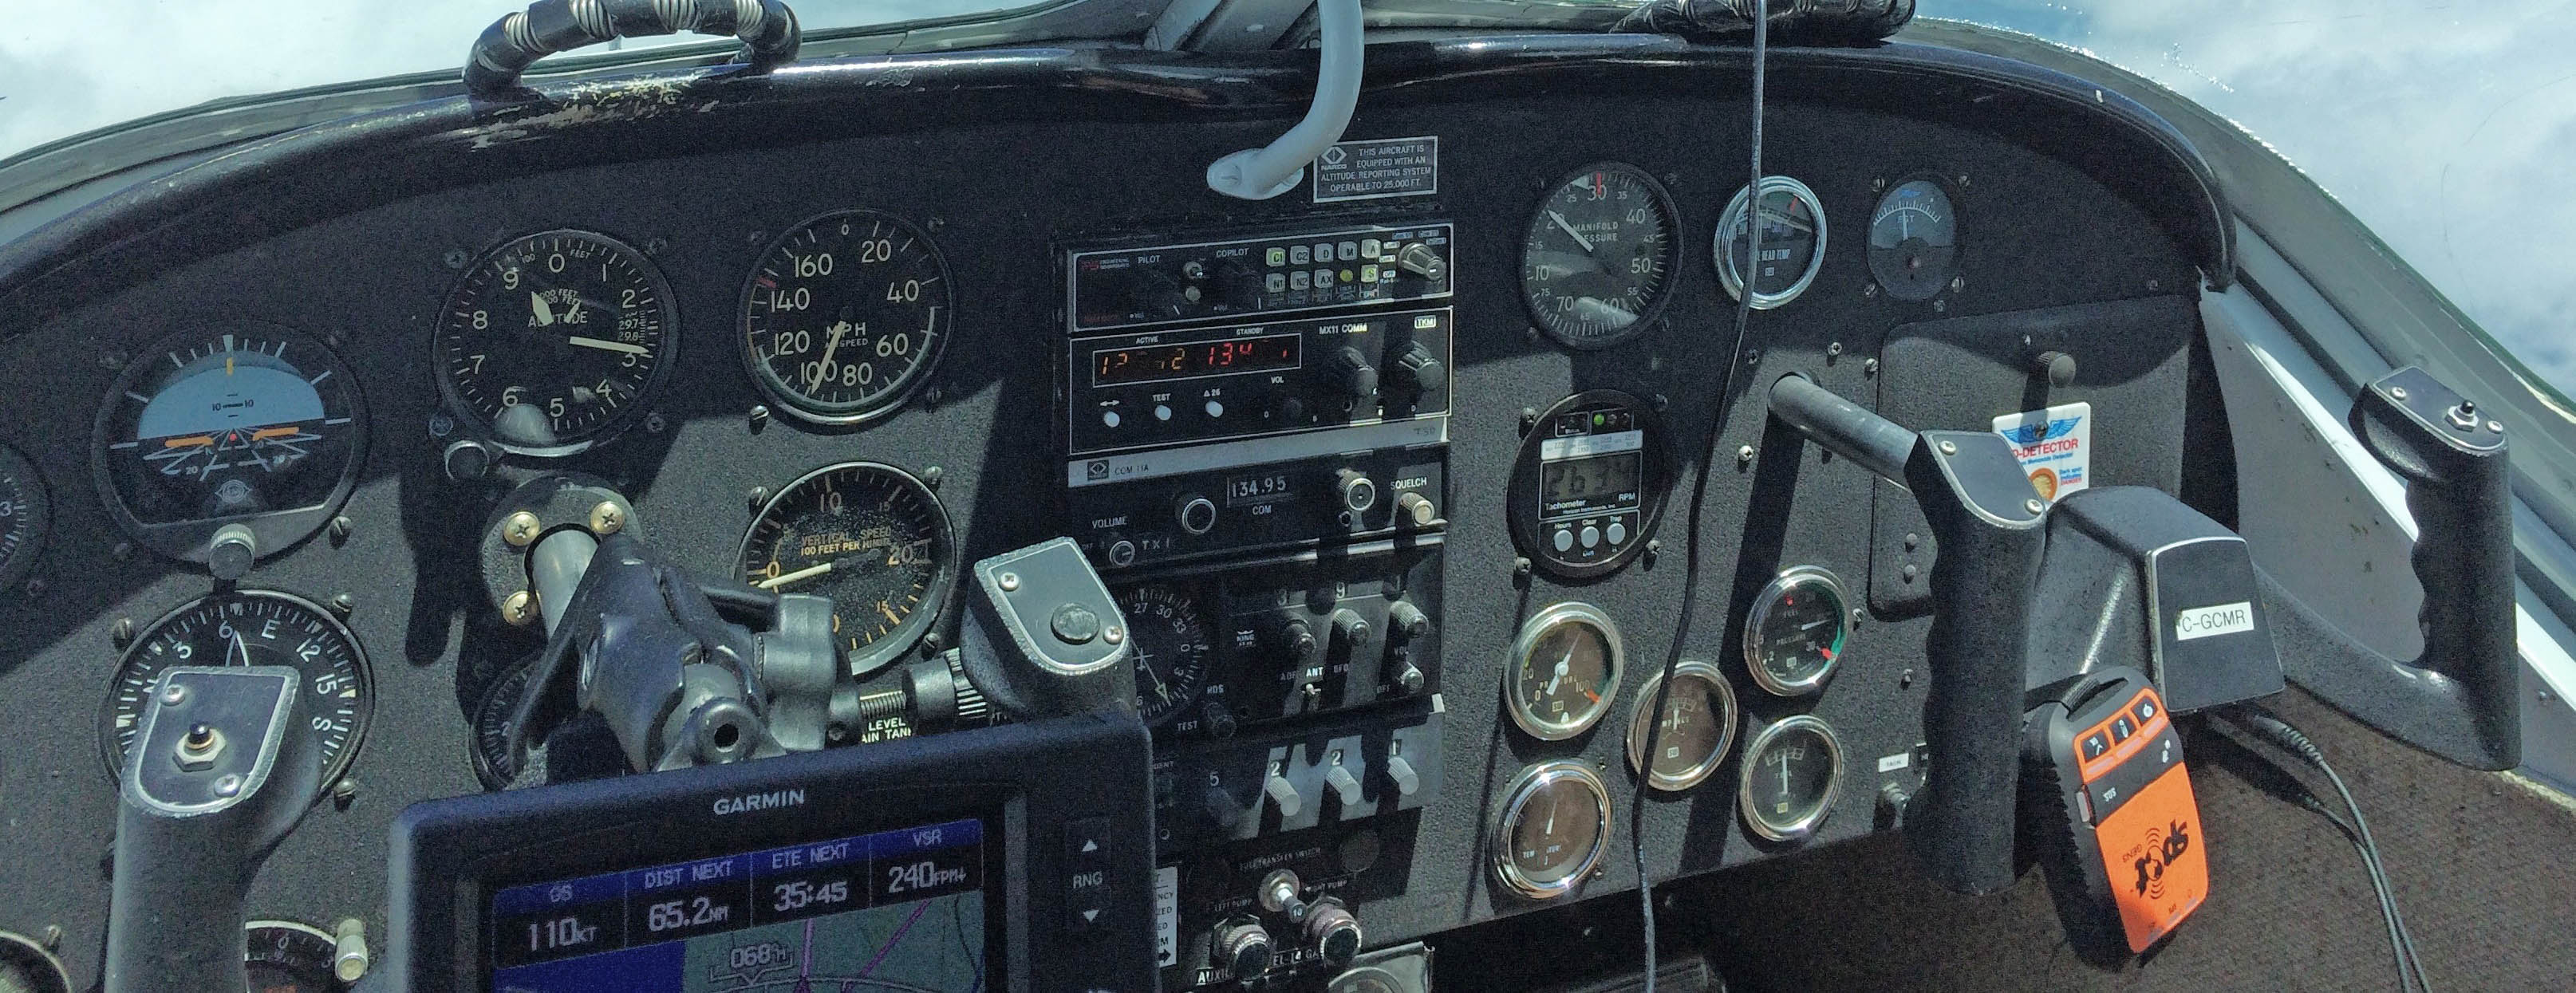 Lake LA-4-200 panel